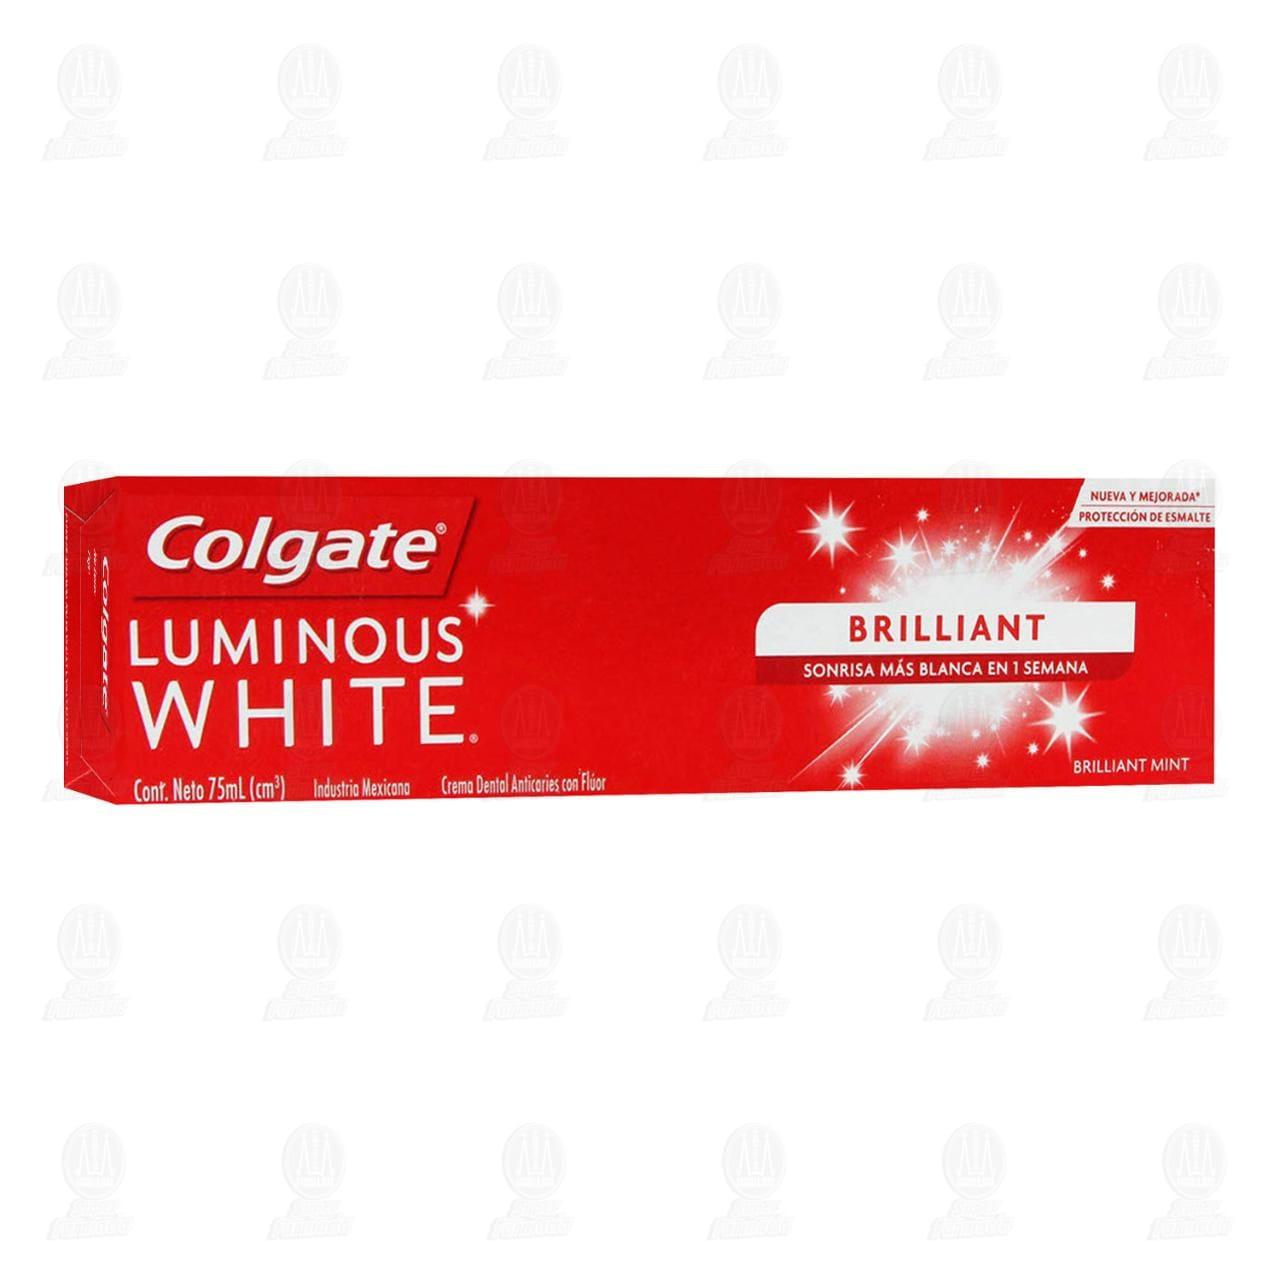 Pasta dental Colgate Luminous White, 75 ml.